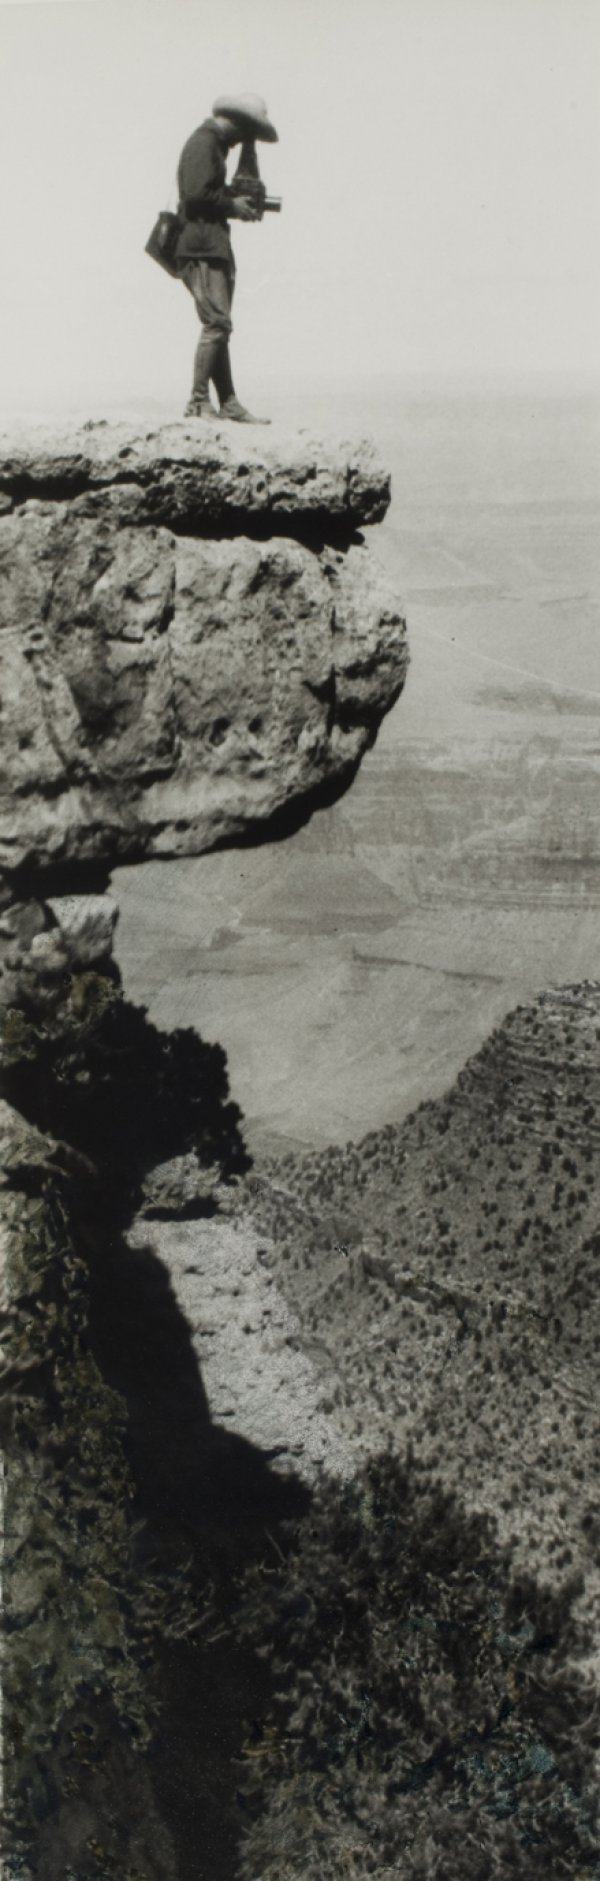 Fannie E. Coburn, Alvin Langdon Coburn at the Grand Canyon